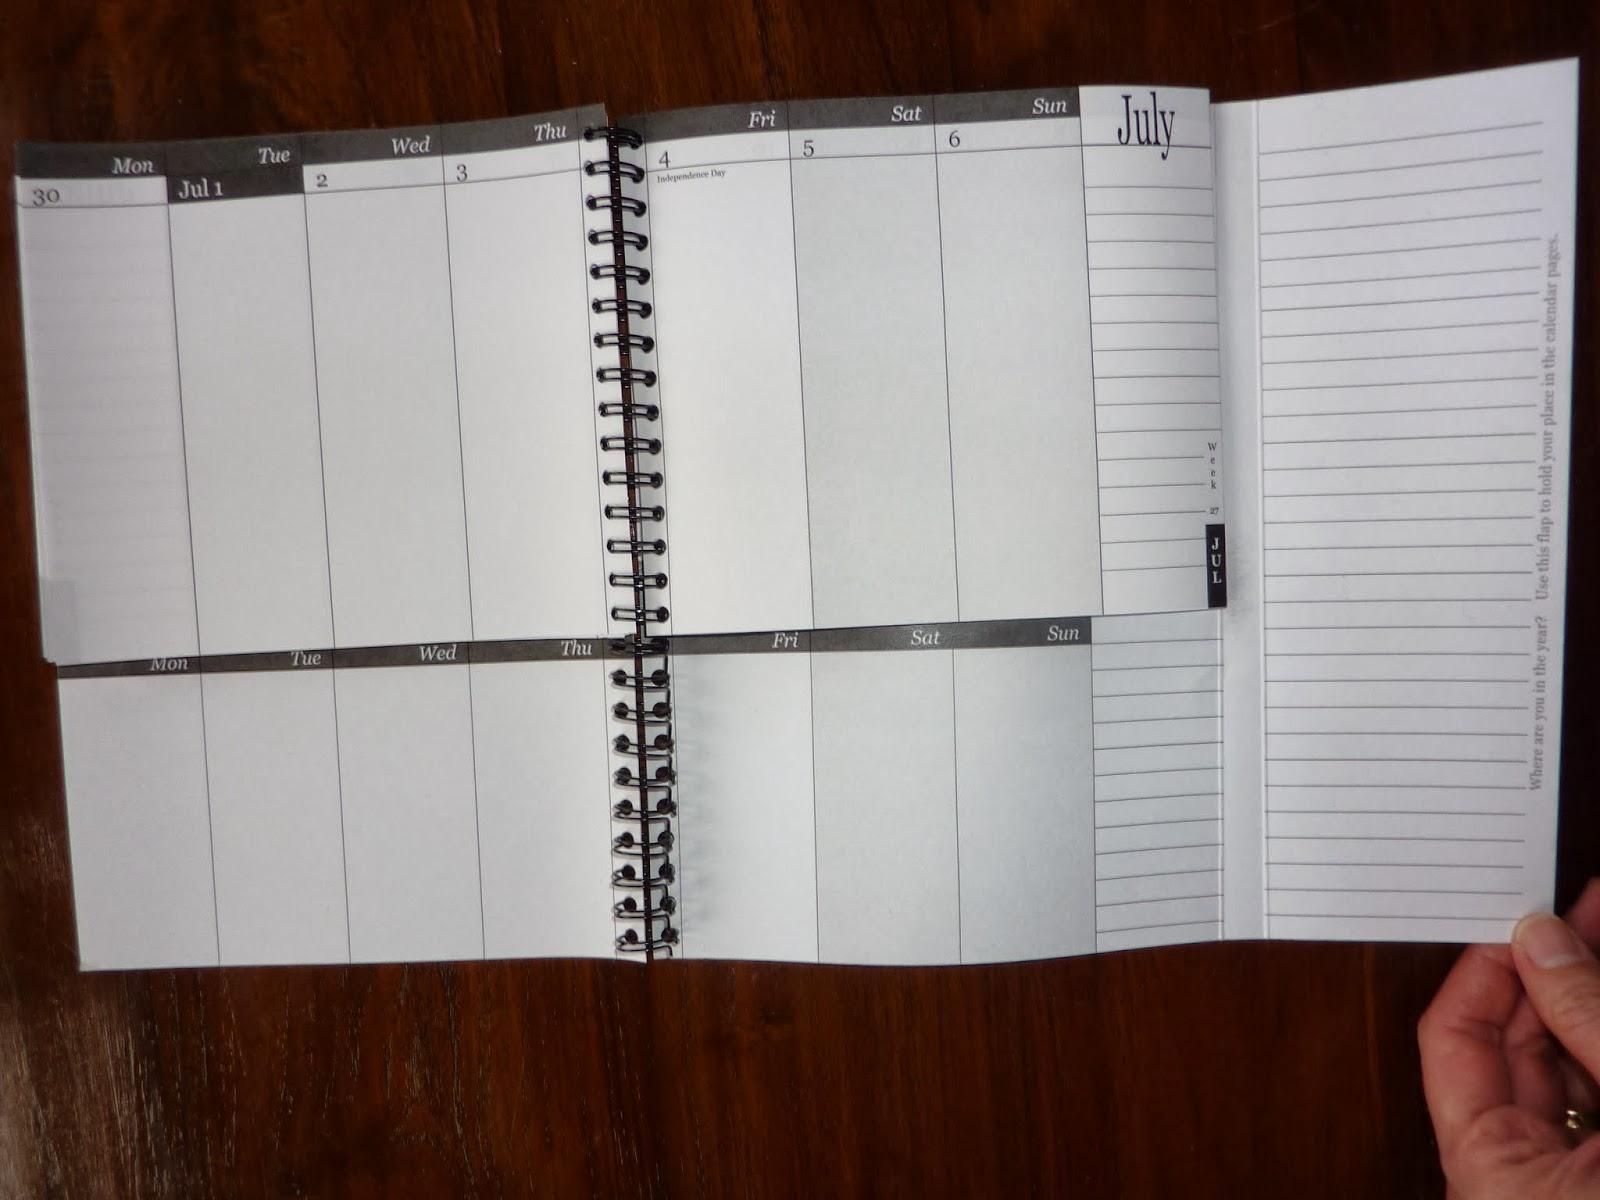 Qt Weekly Calendar : Plannerisms weekdate  academic year planner